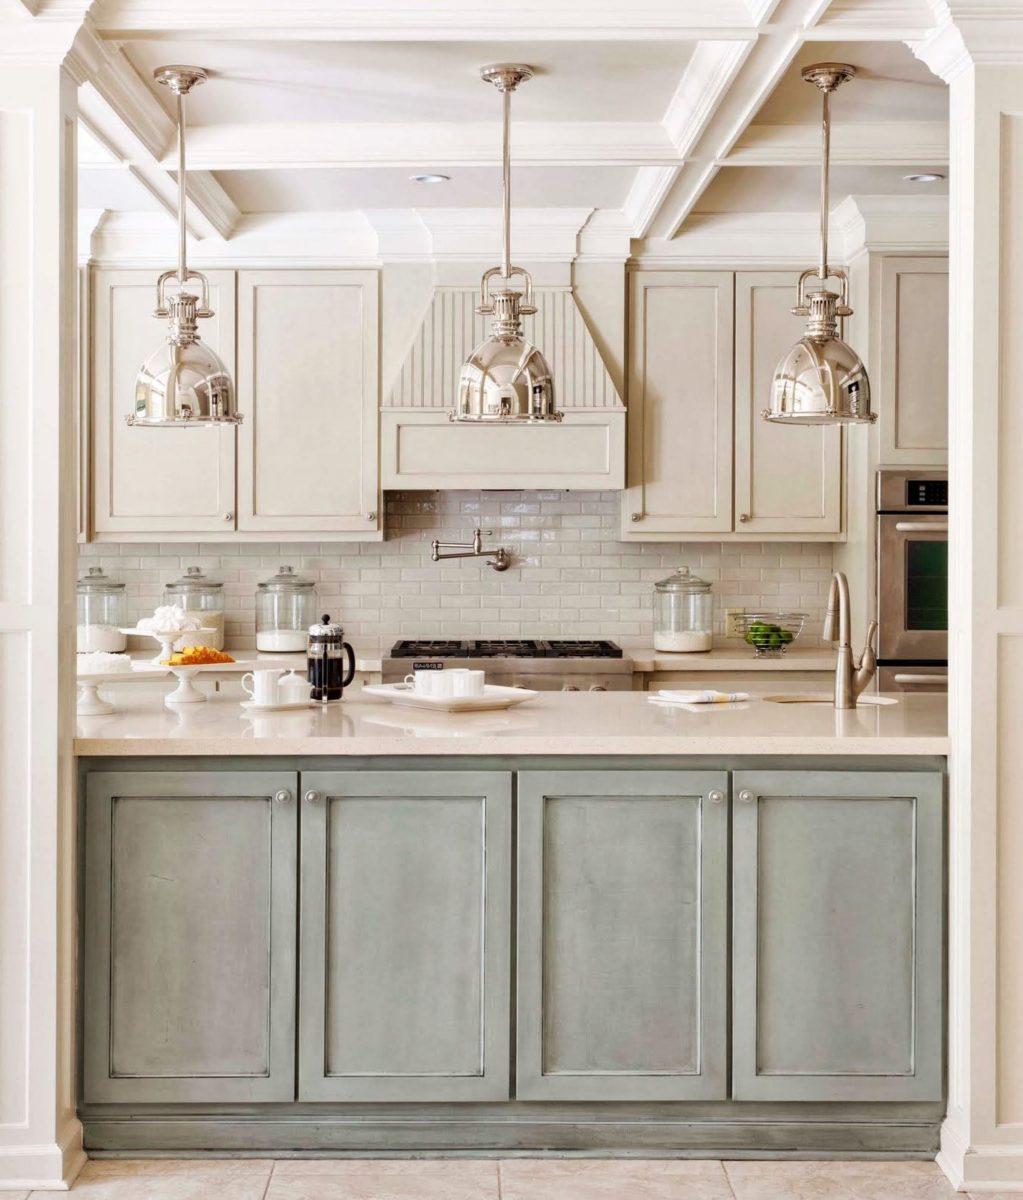 Cucina Stile Shabby | Cucine Stile Shabby Chic Ikea Inspiring ...